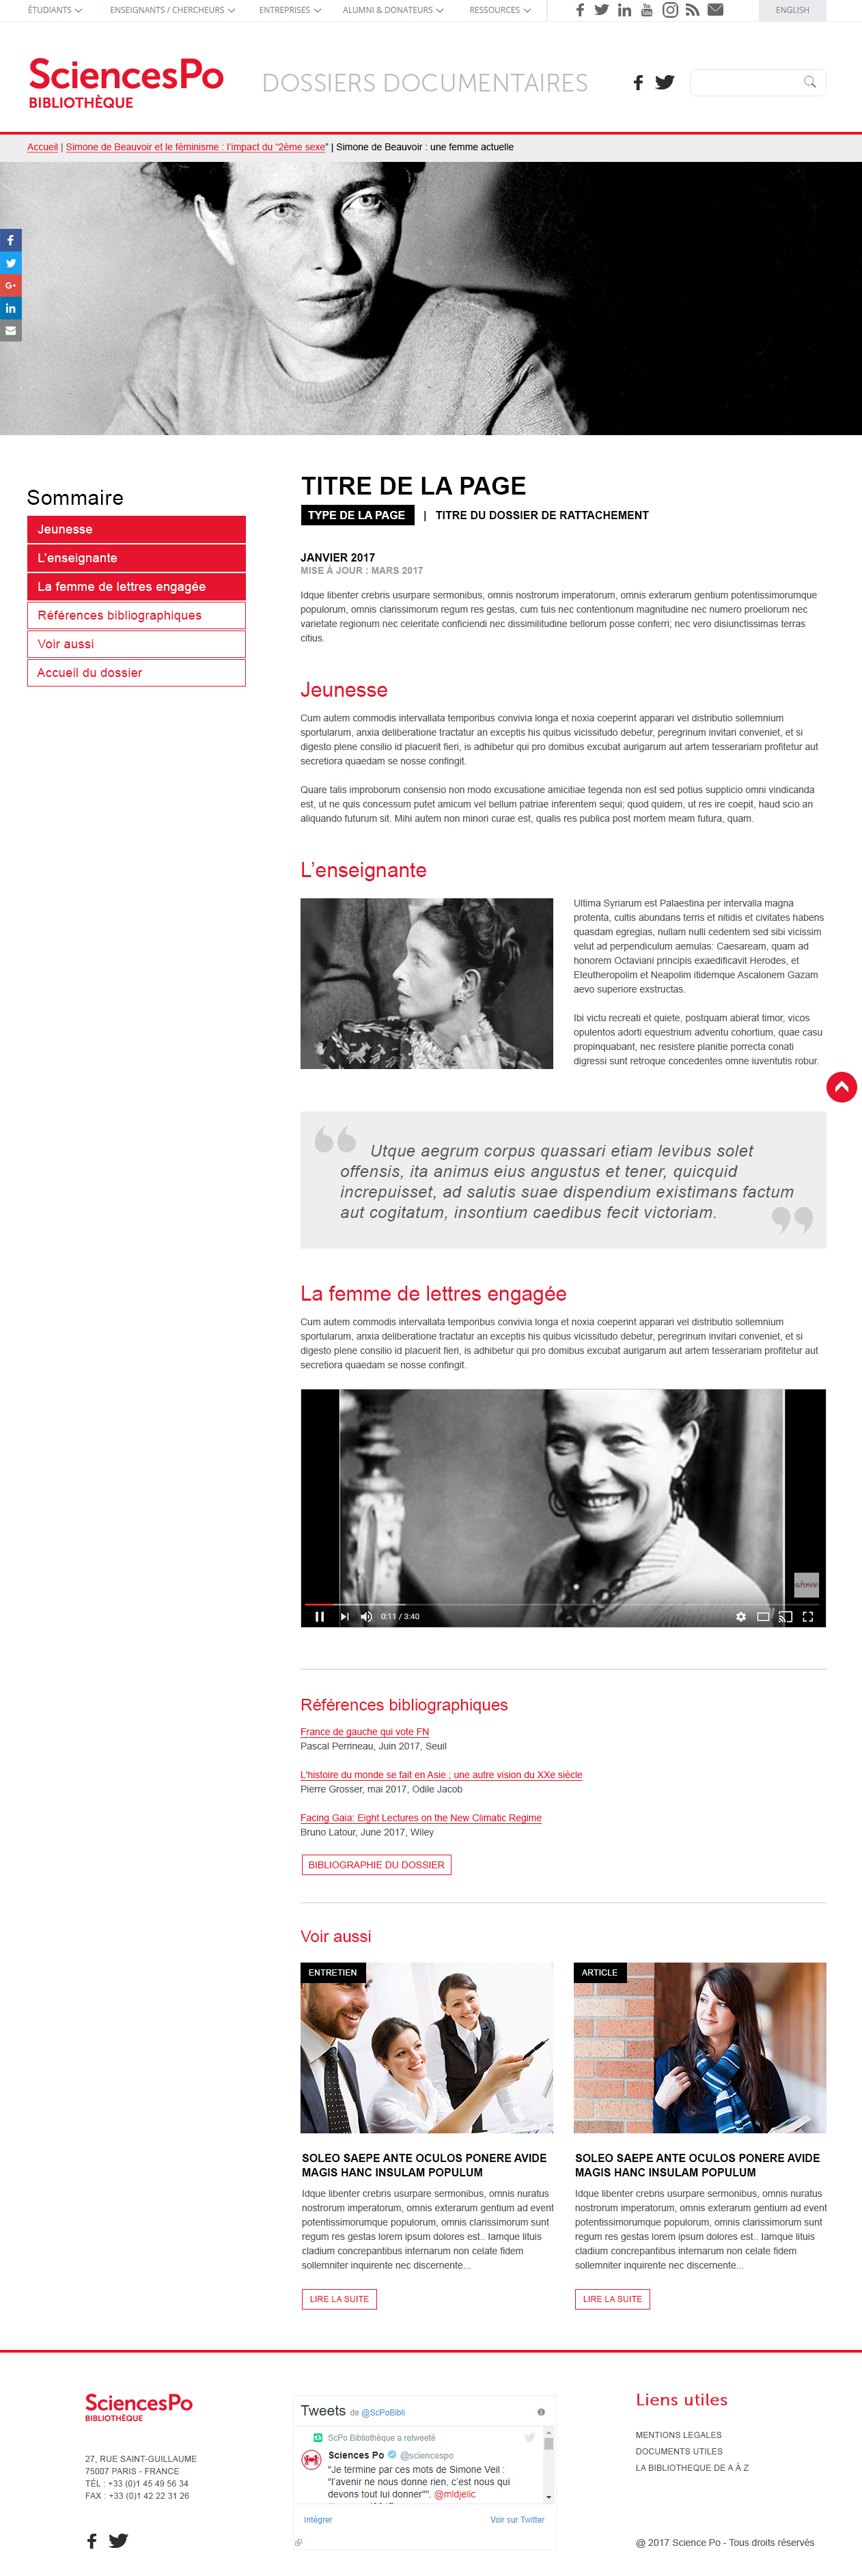 Sciences Po Documentaire – Article